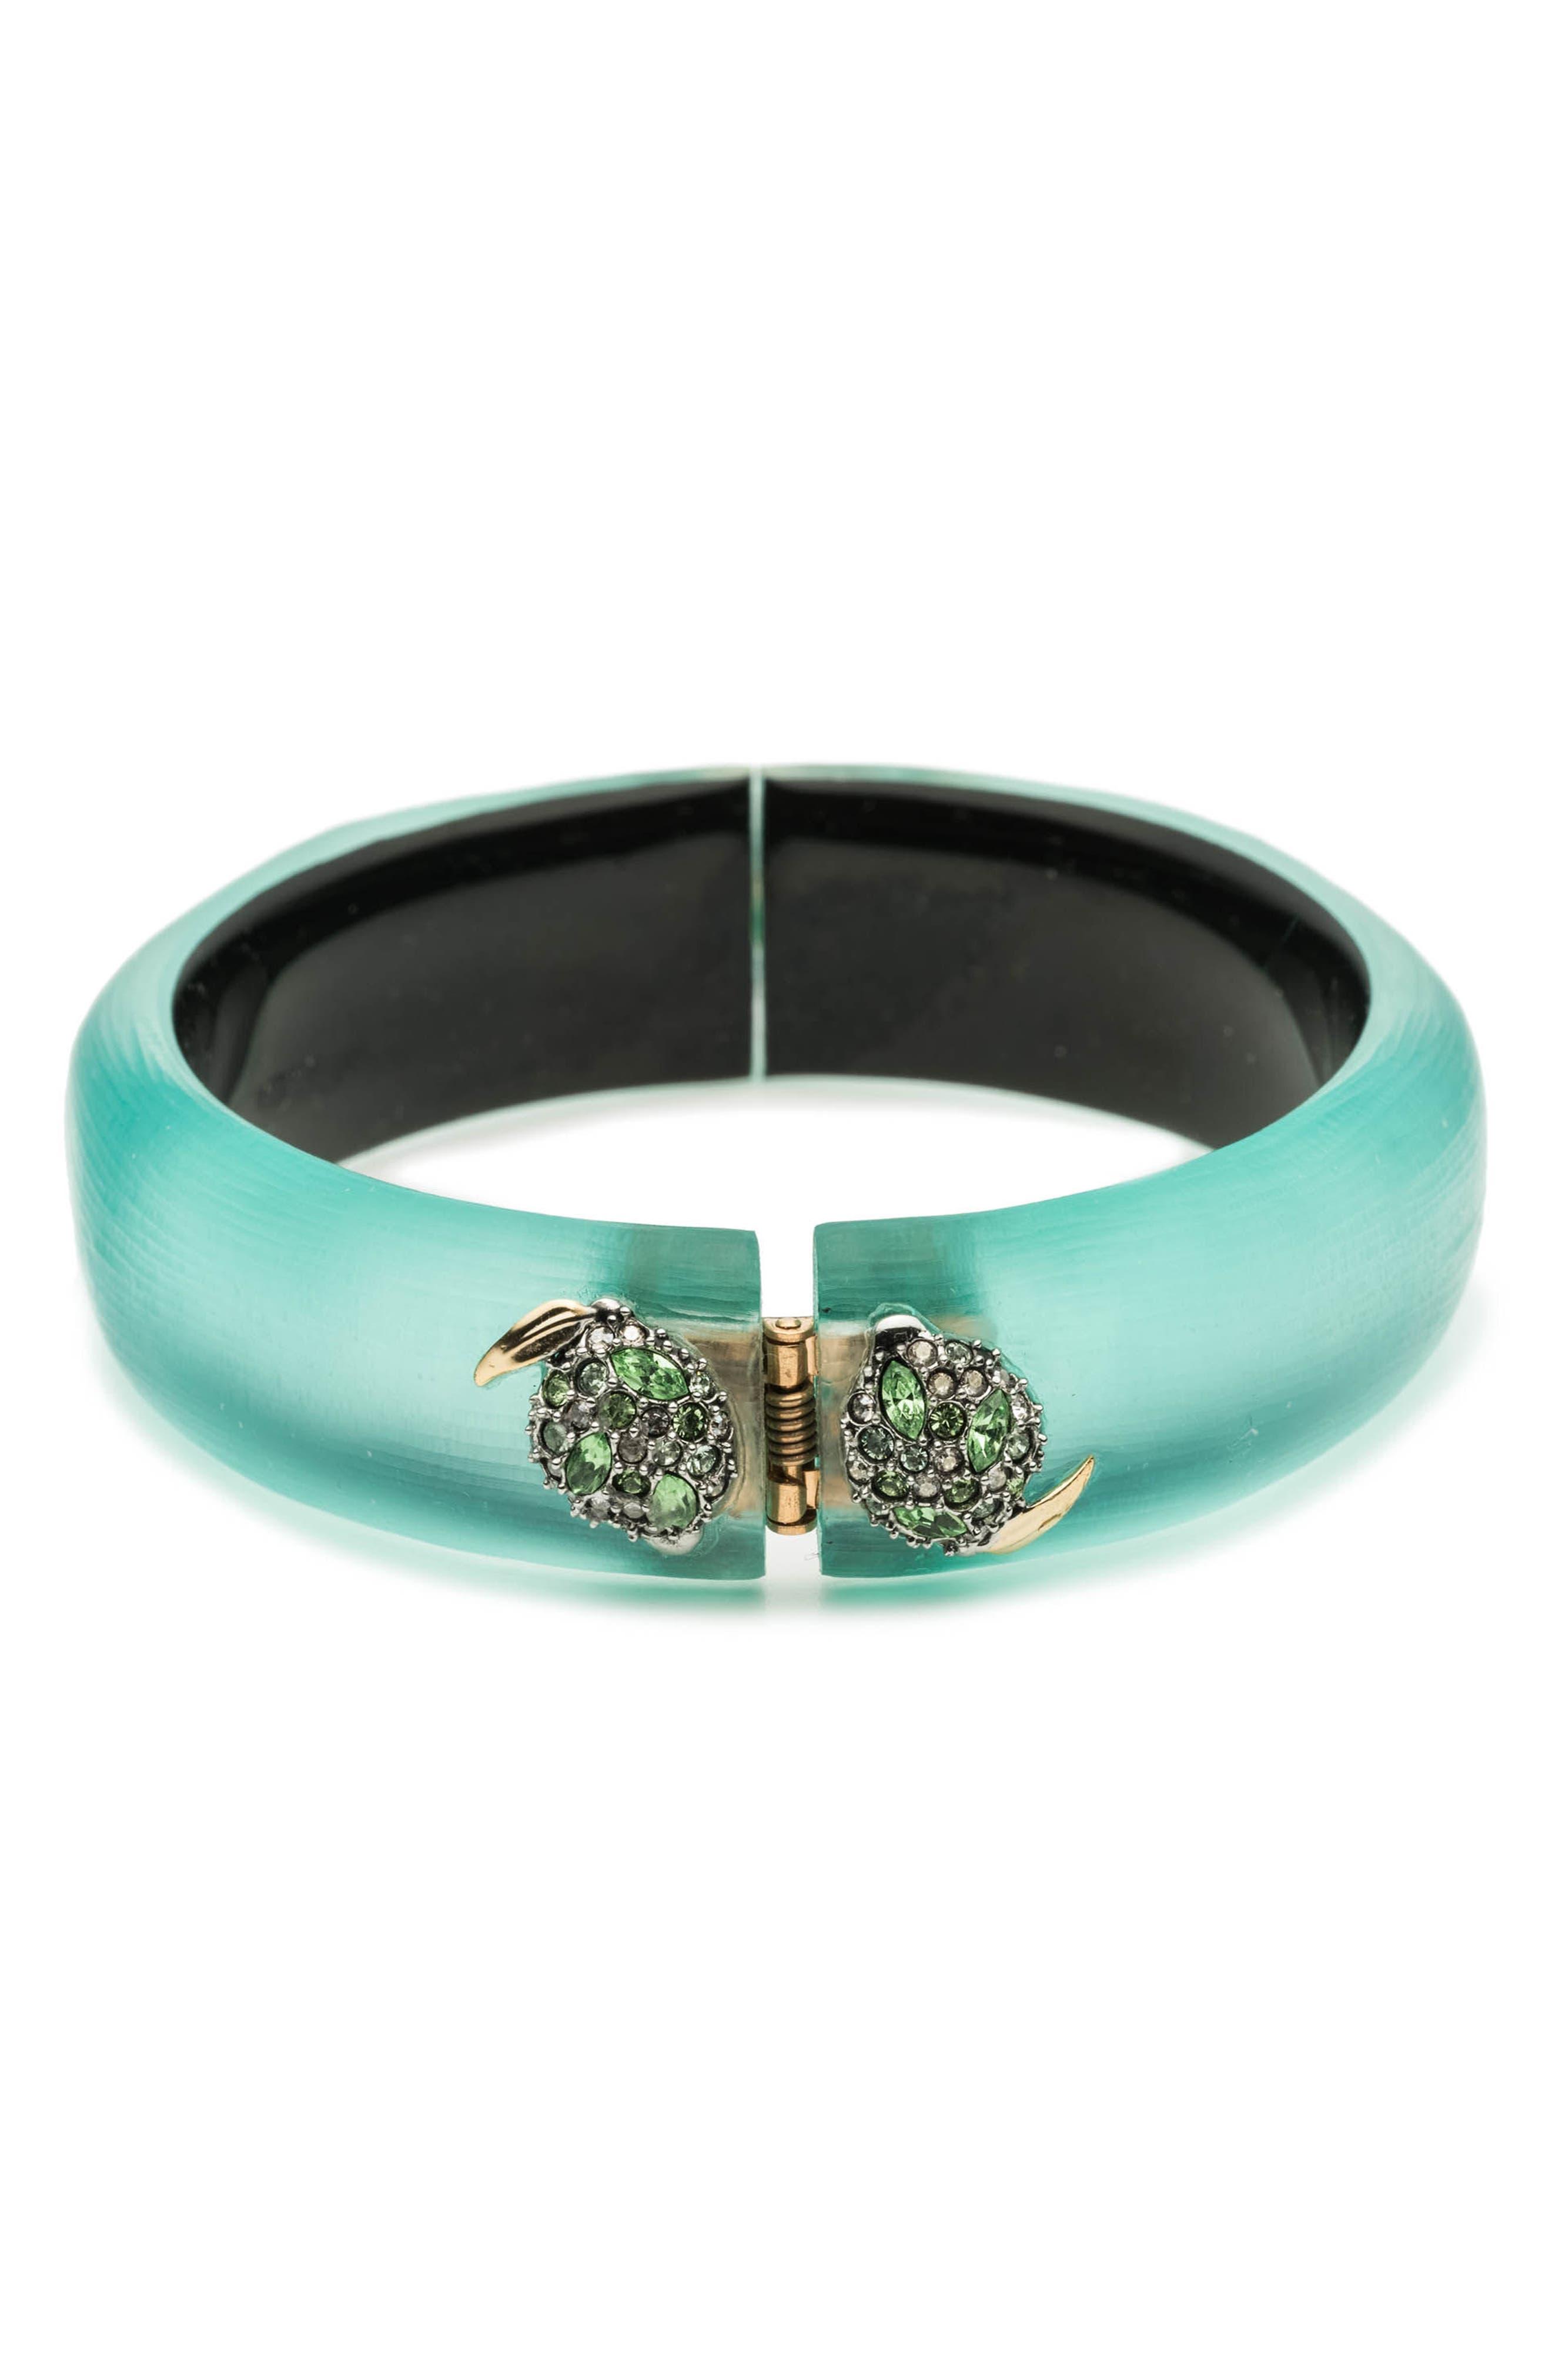 Medium Lime Hinge Bracelet,                             Alternate thumbnail 2, color,                             Mint Green